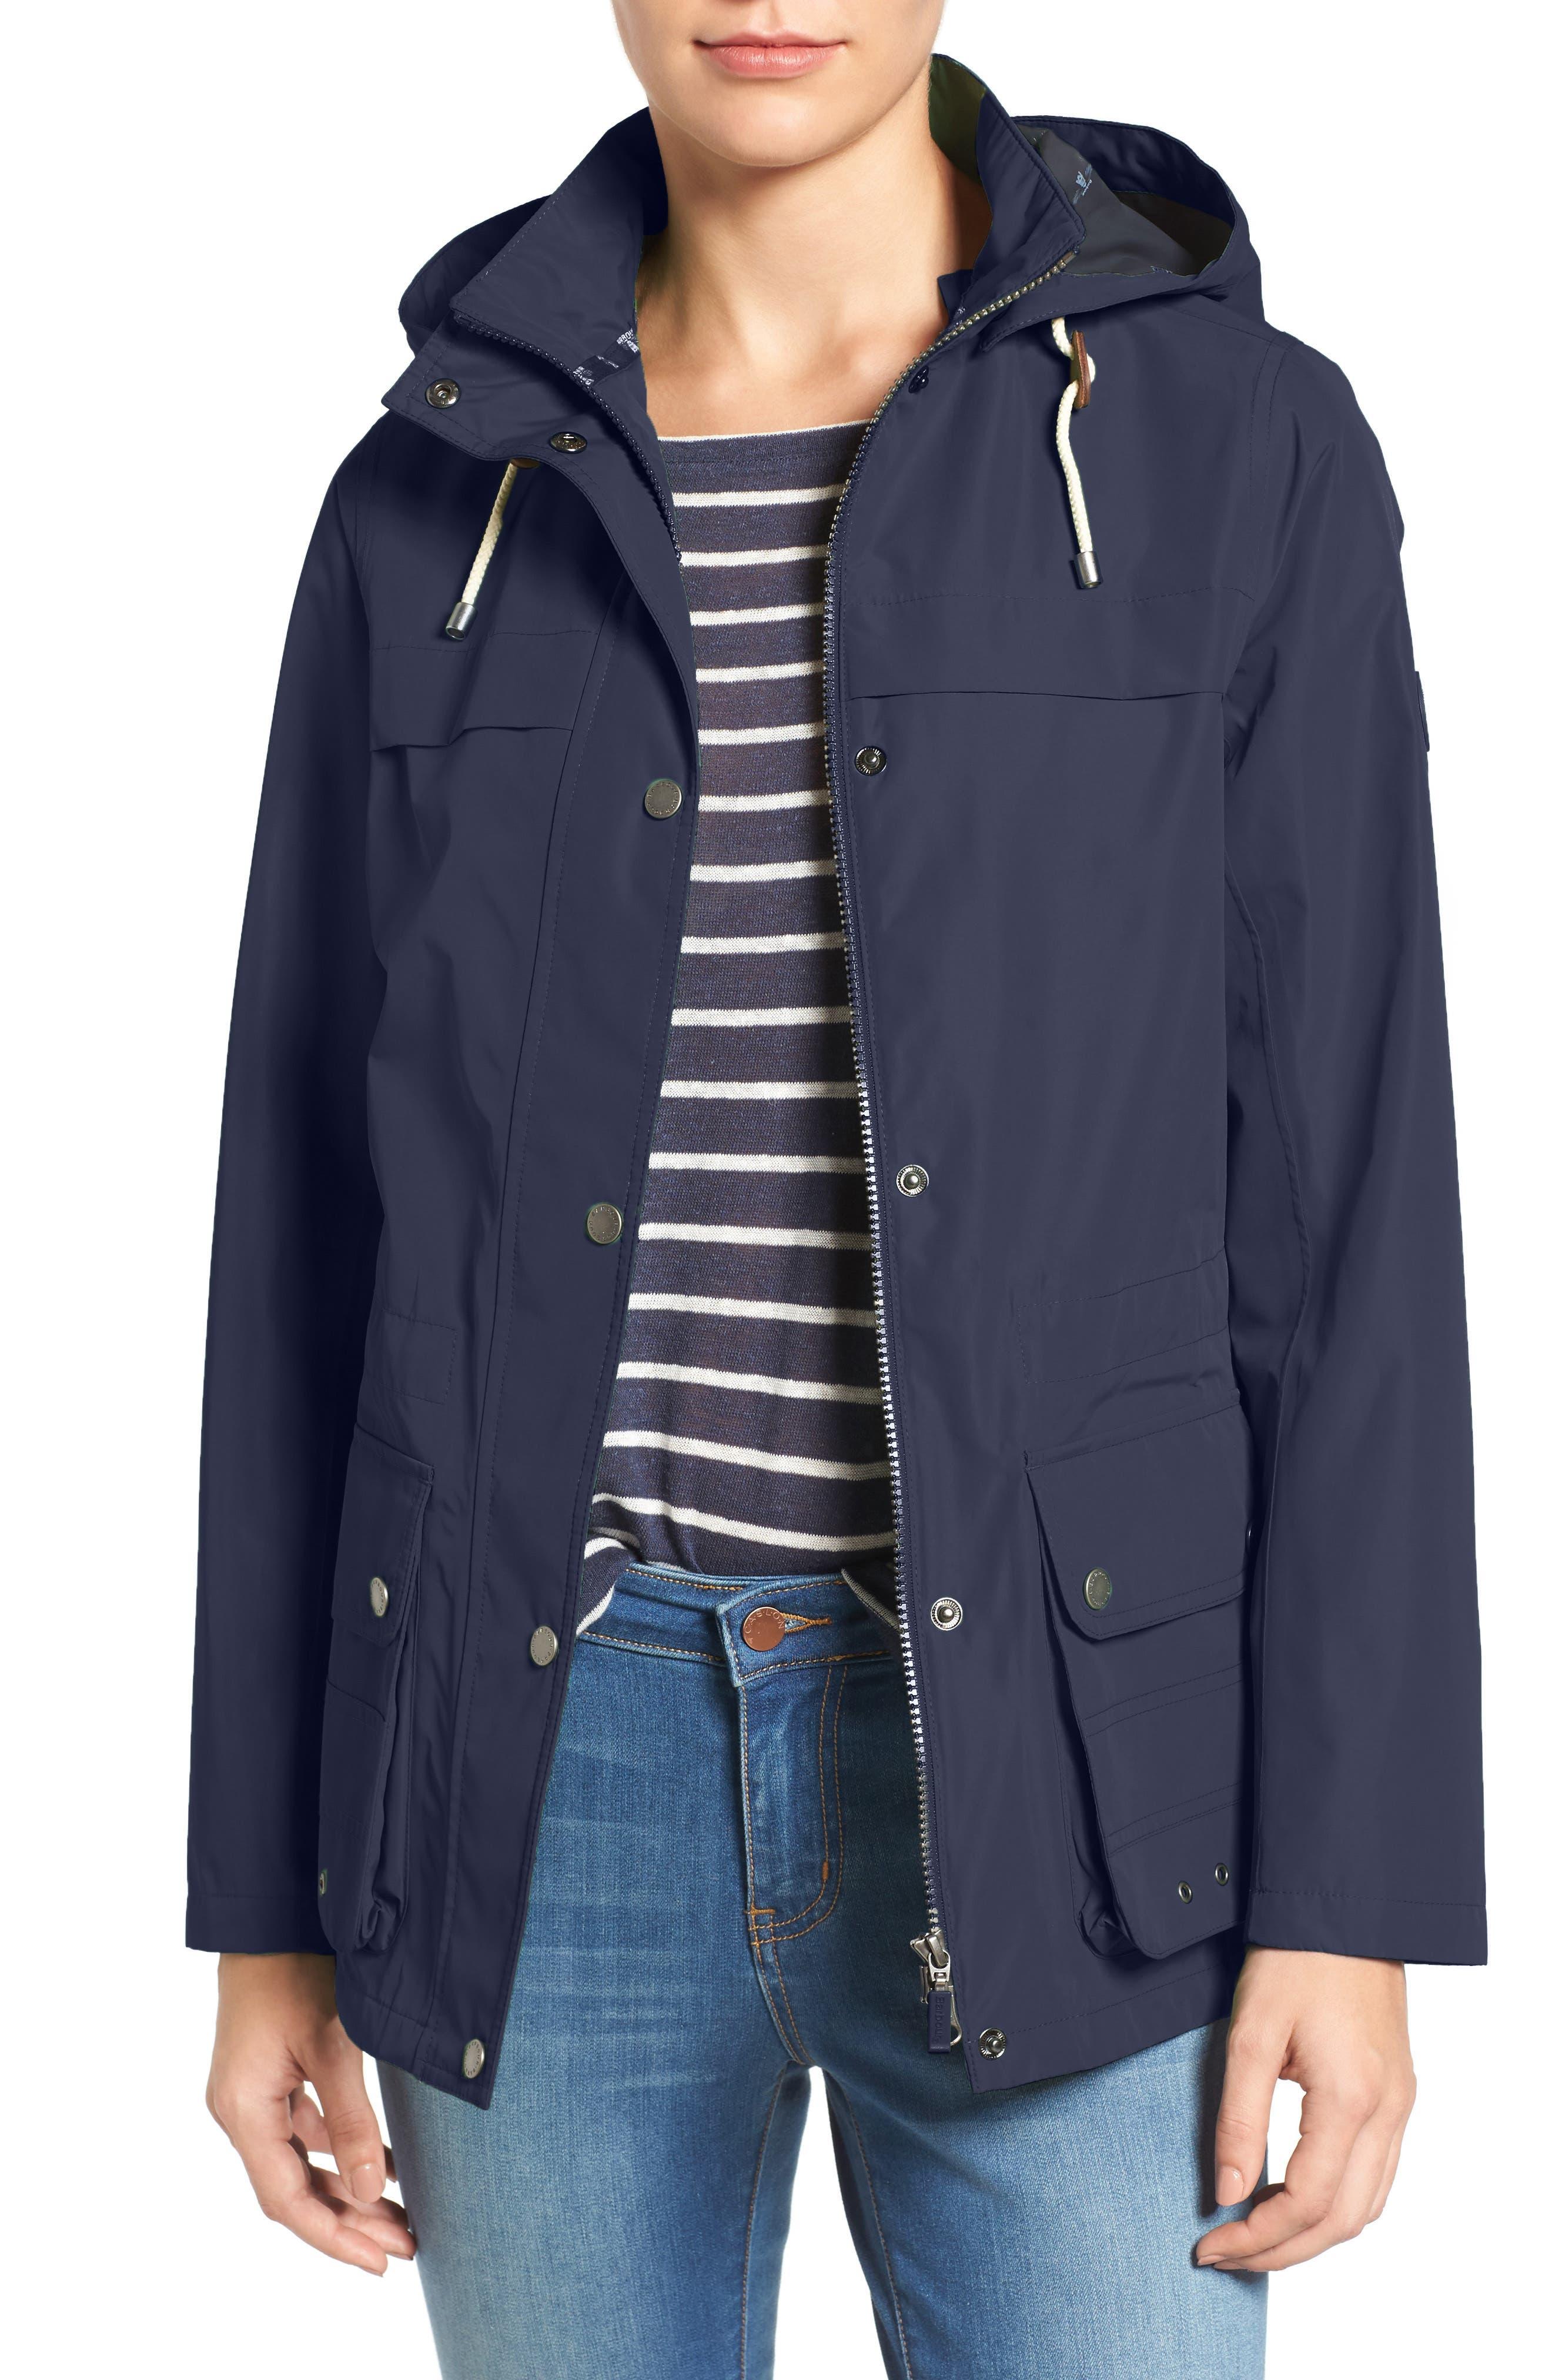 Alternate Image 1 Selected - Barbour Lowmoore Raincoat